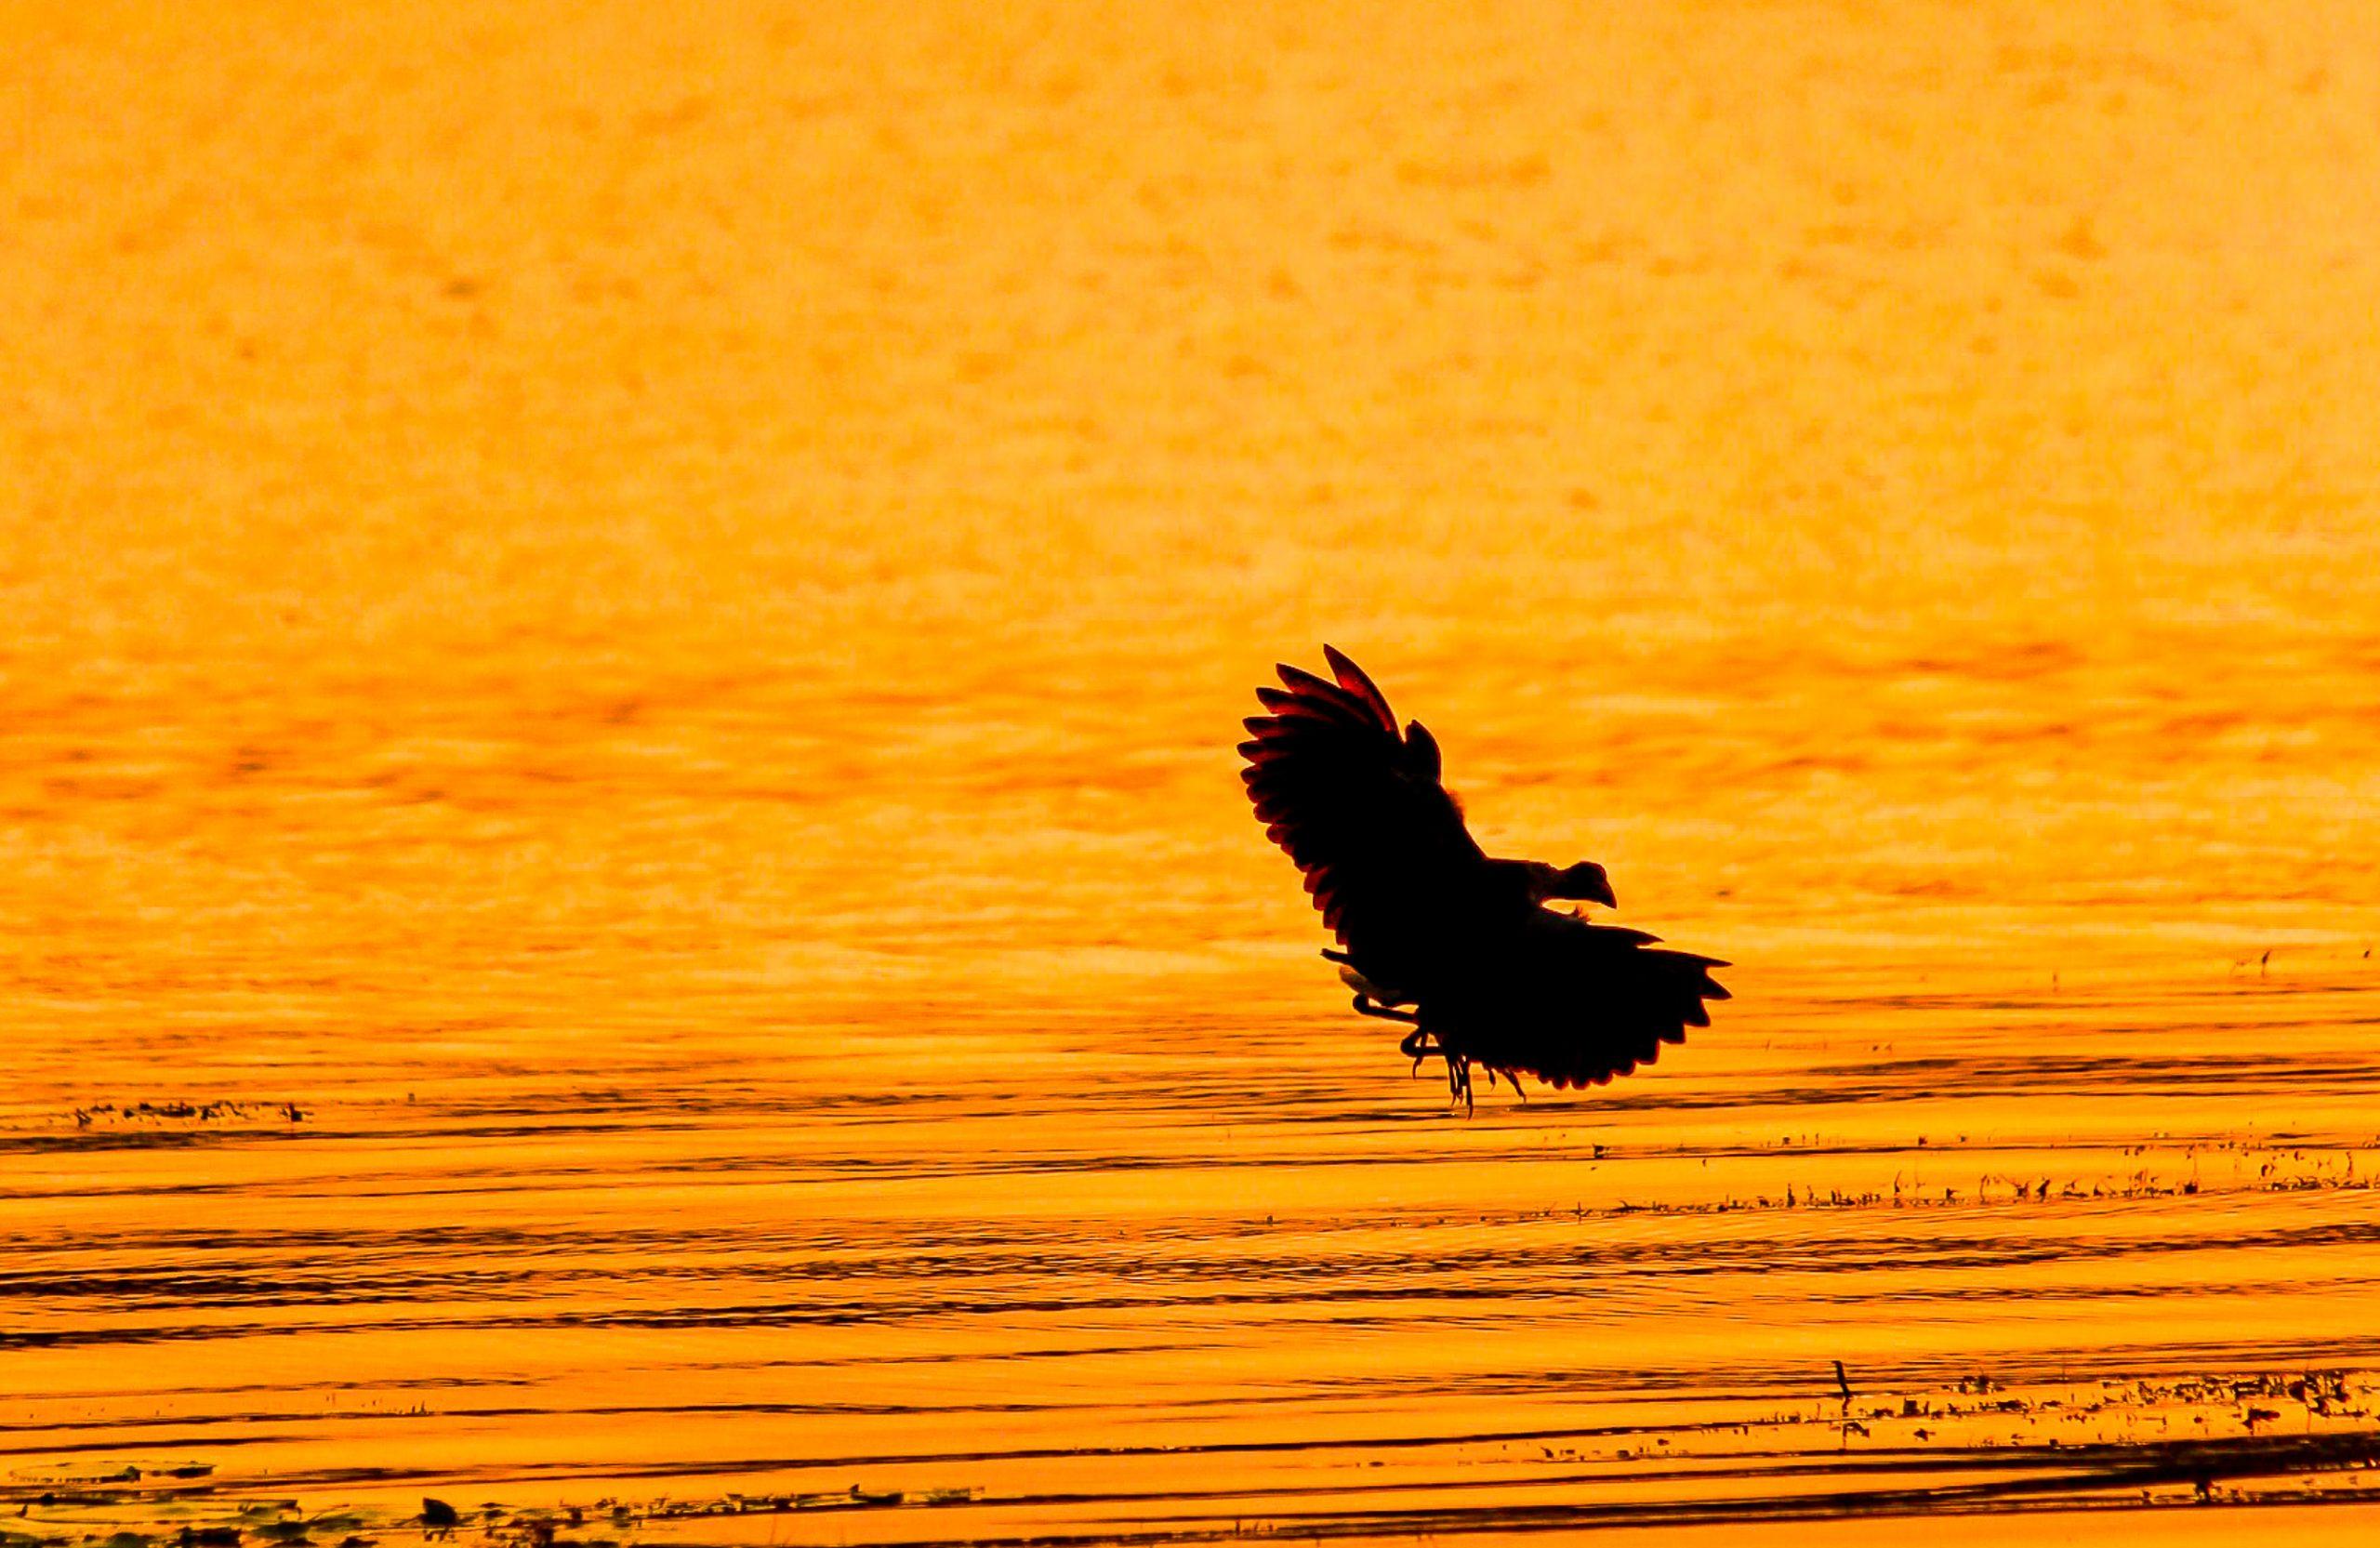 A flying bird